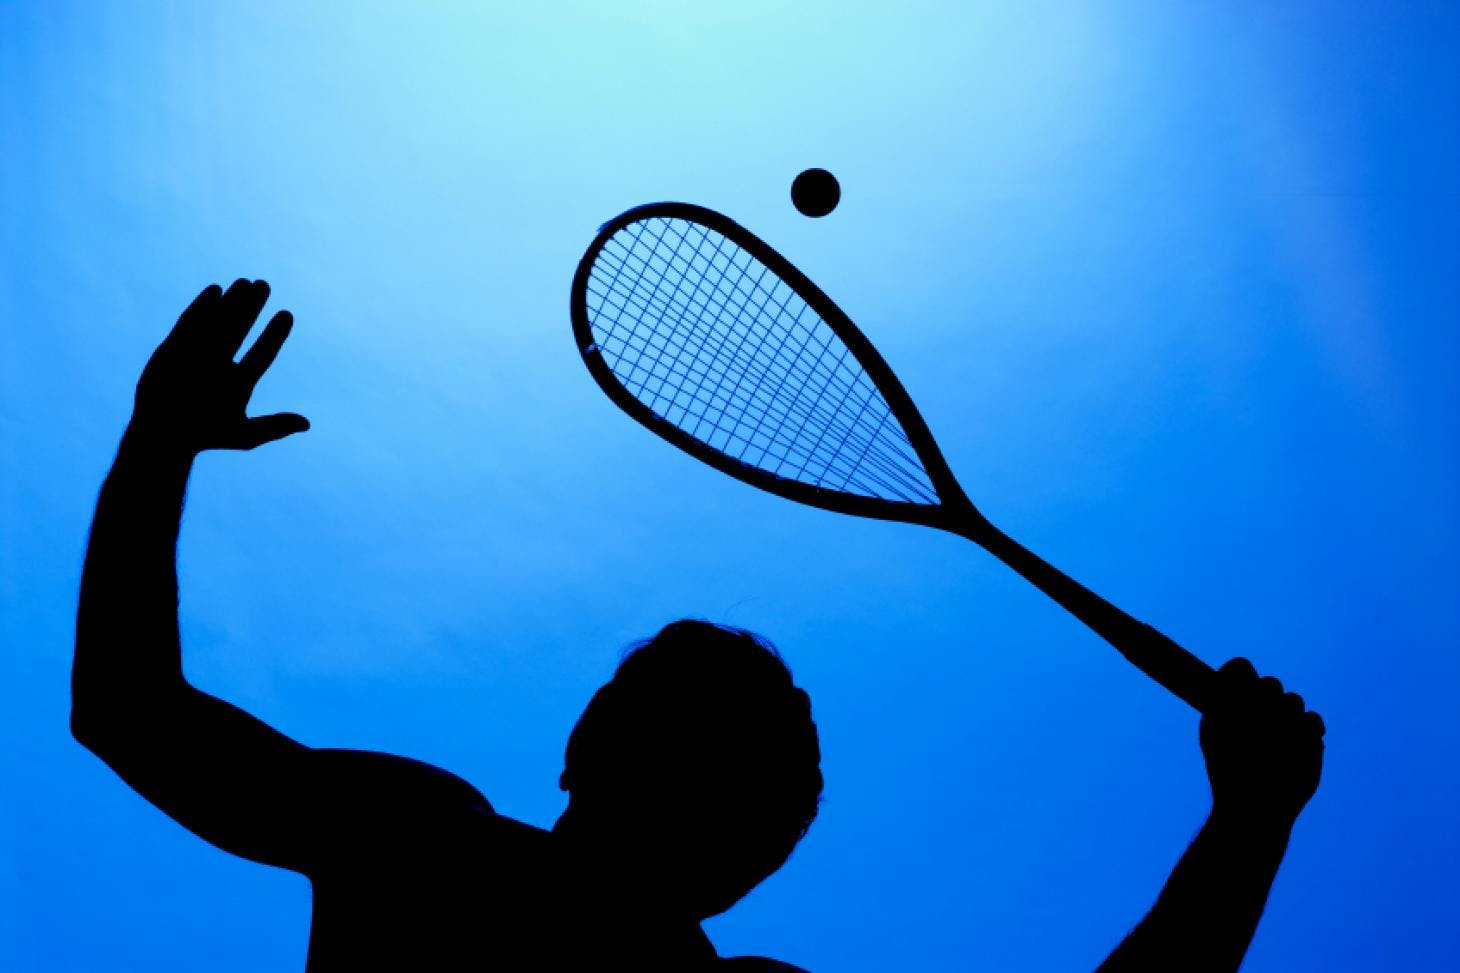 Hogarth Health Club Indoor | Hard squash court